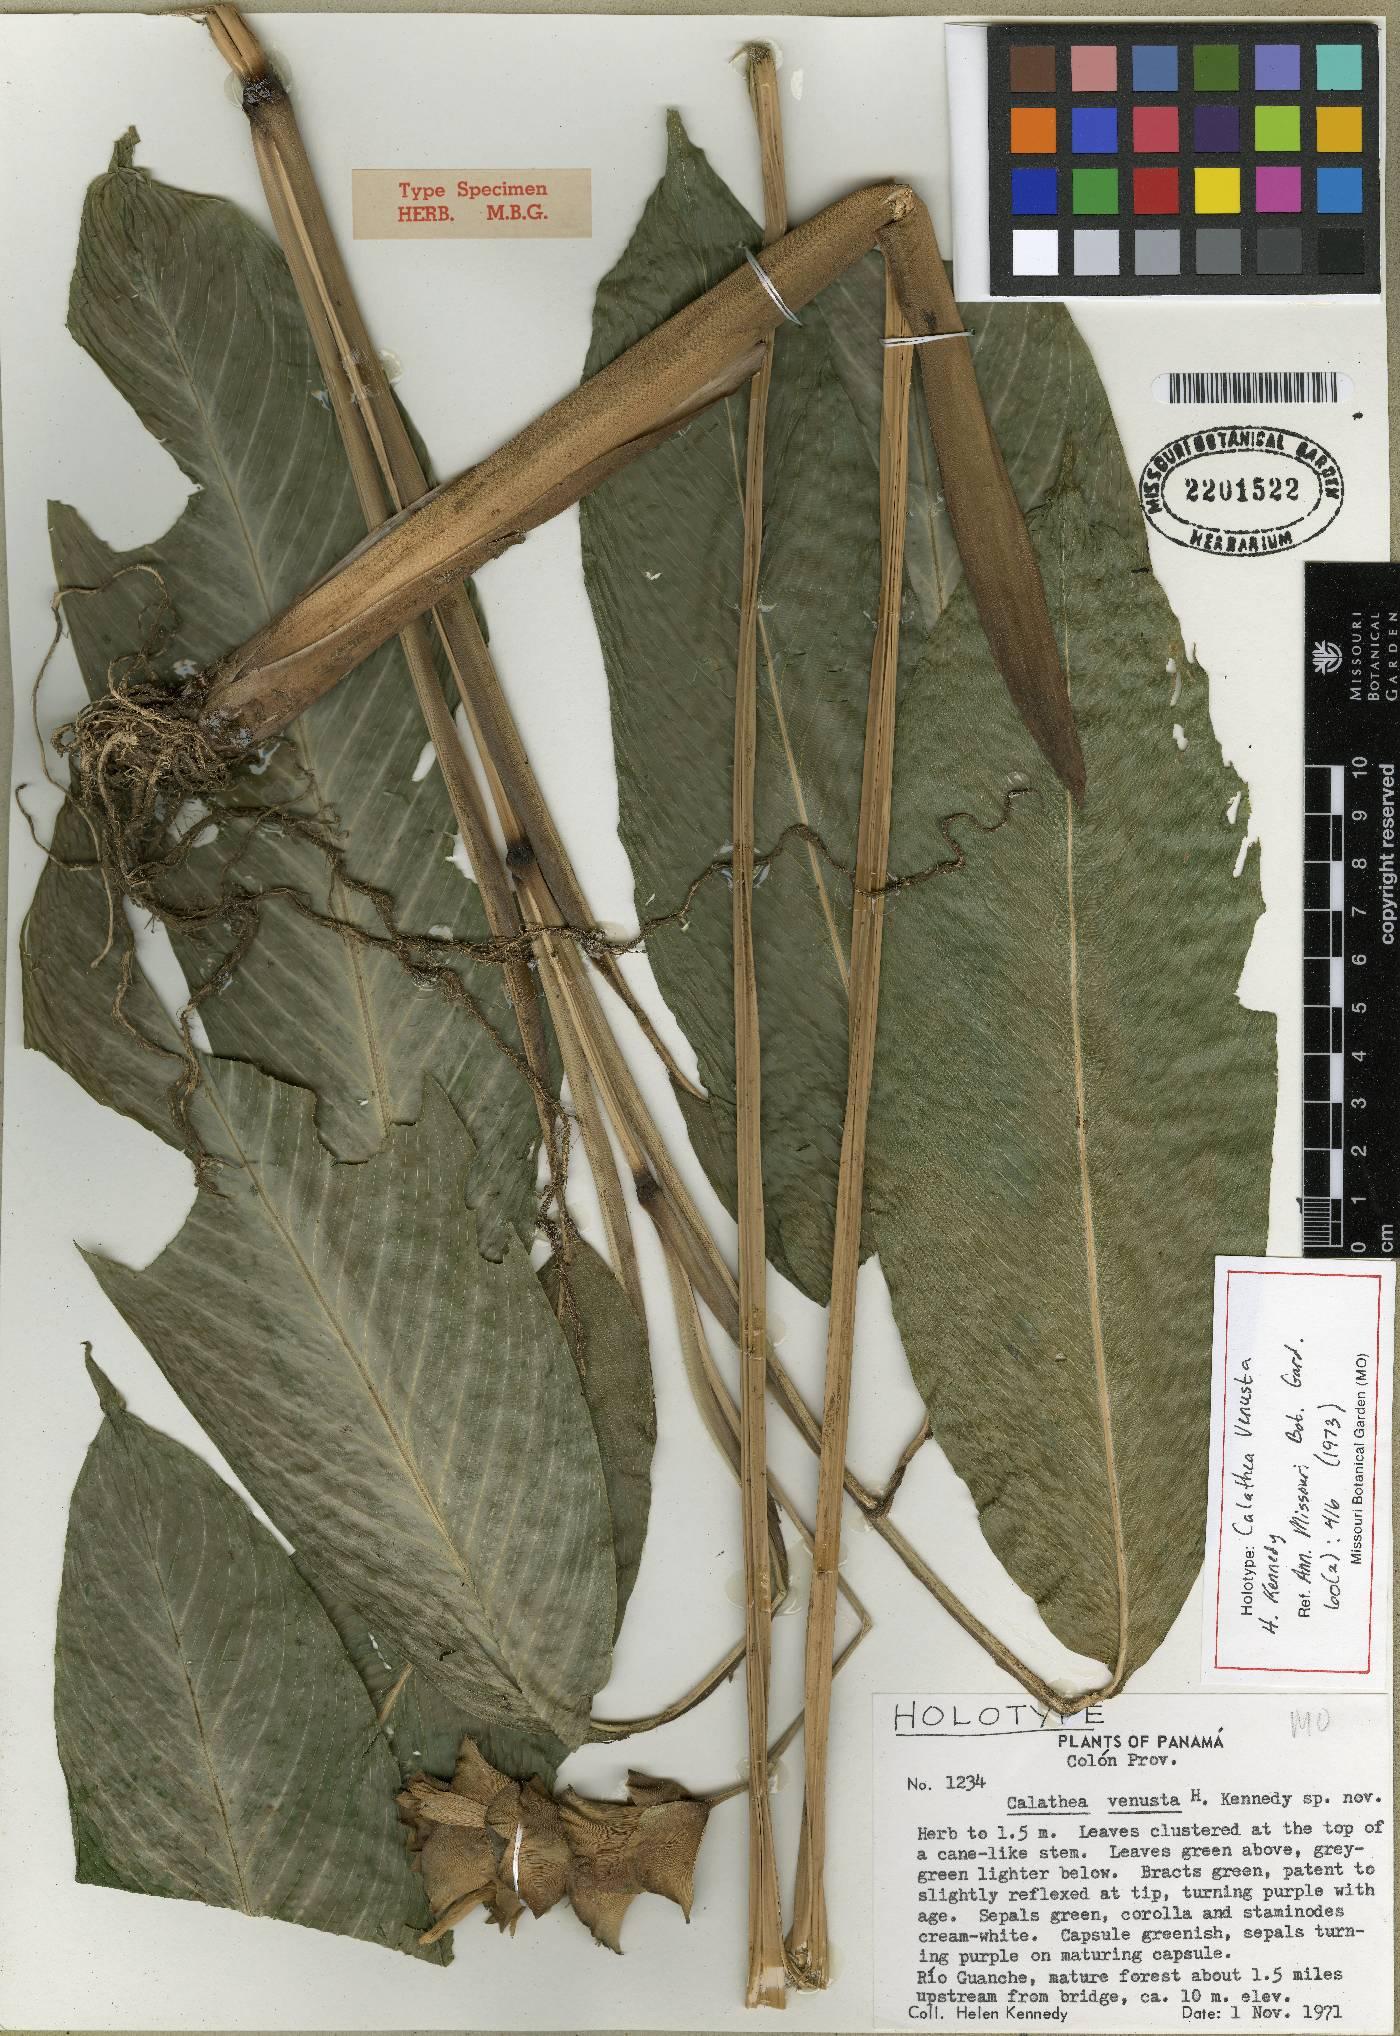 Calathea venusta image